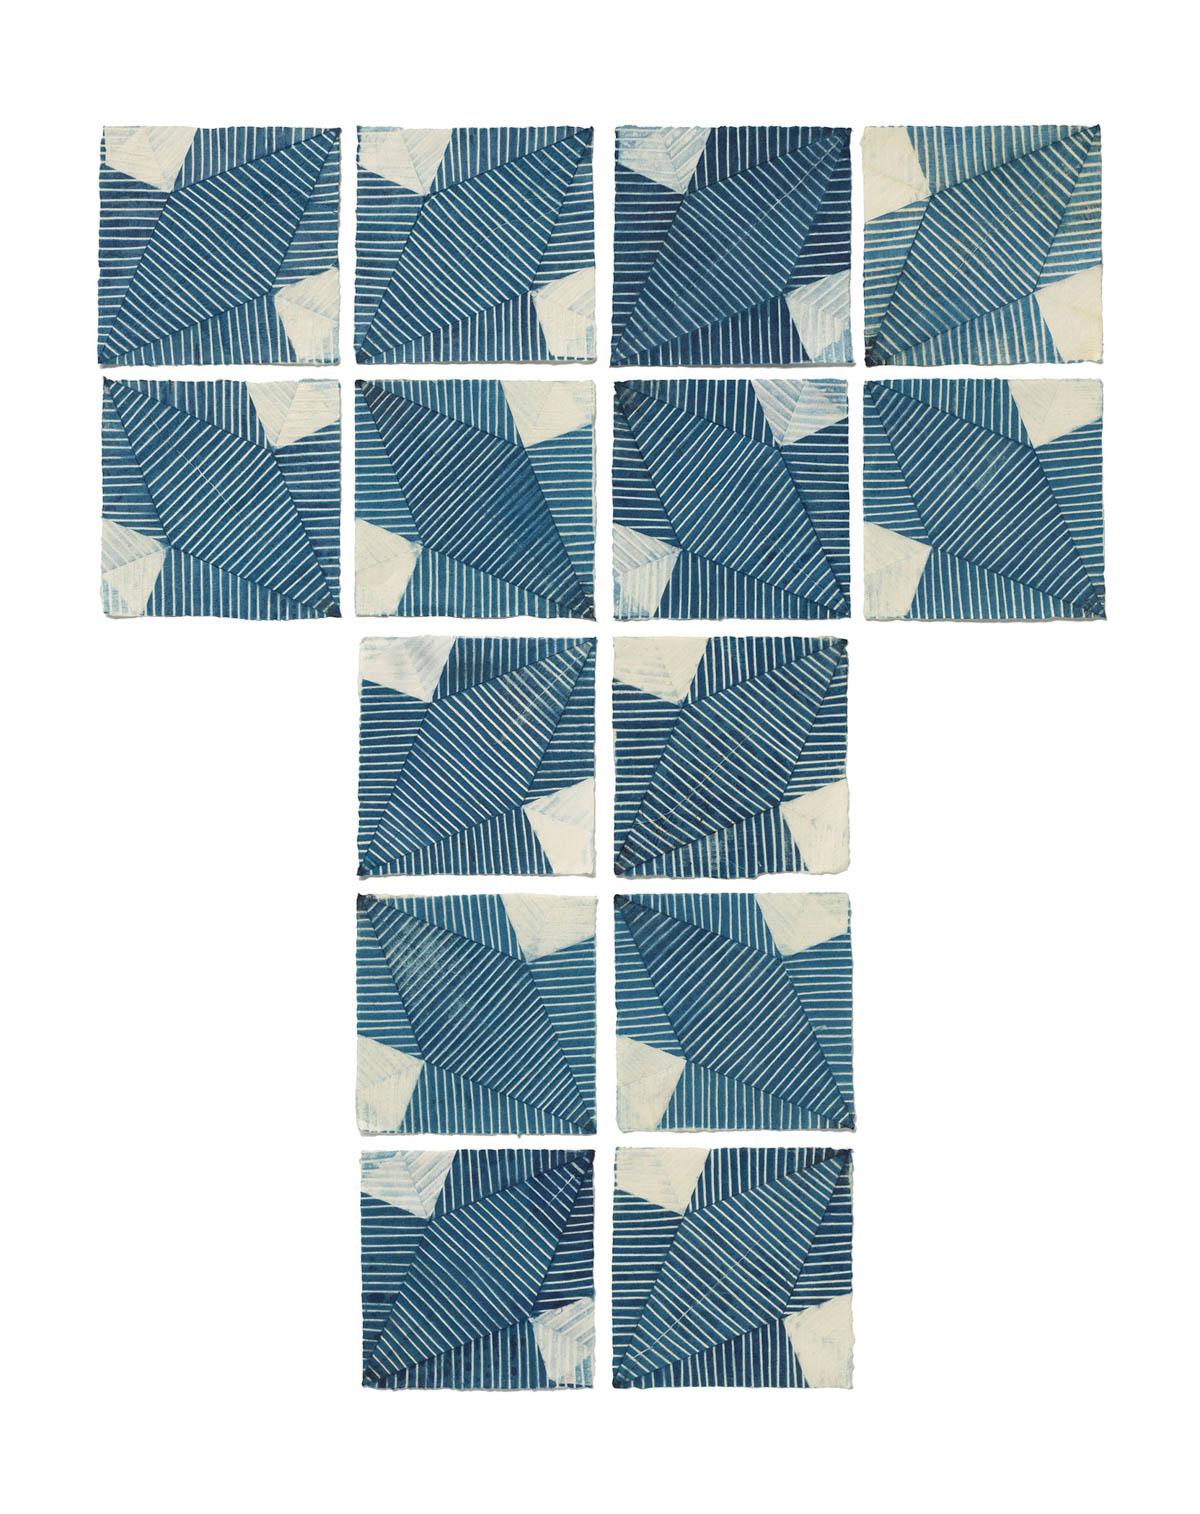 Origami Folds: Patterning Paper Yukata. Ana Lisa Hedstrom, artist